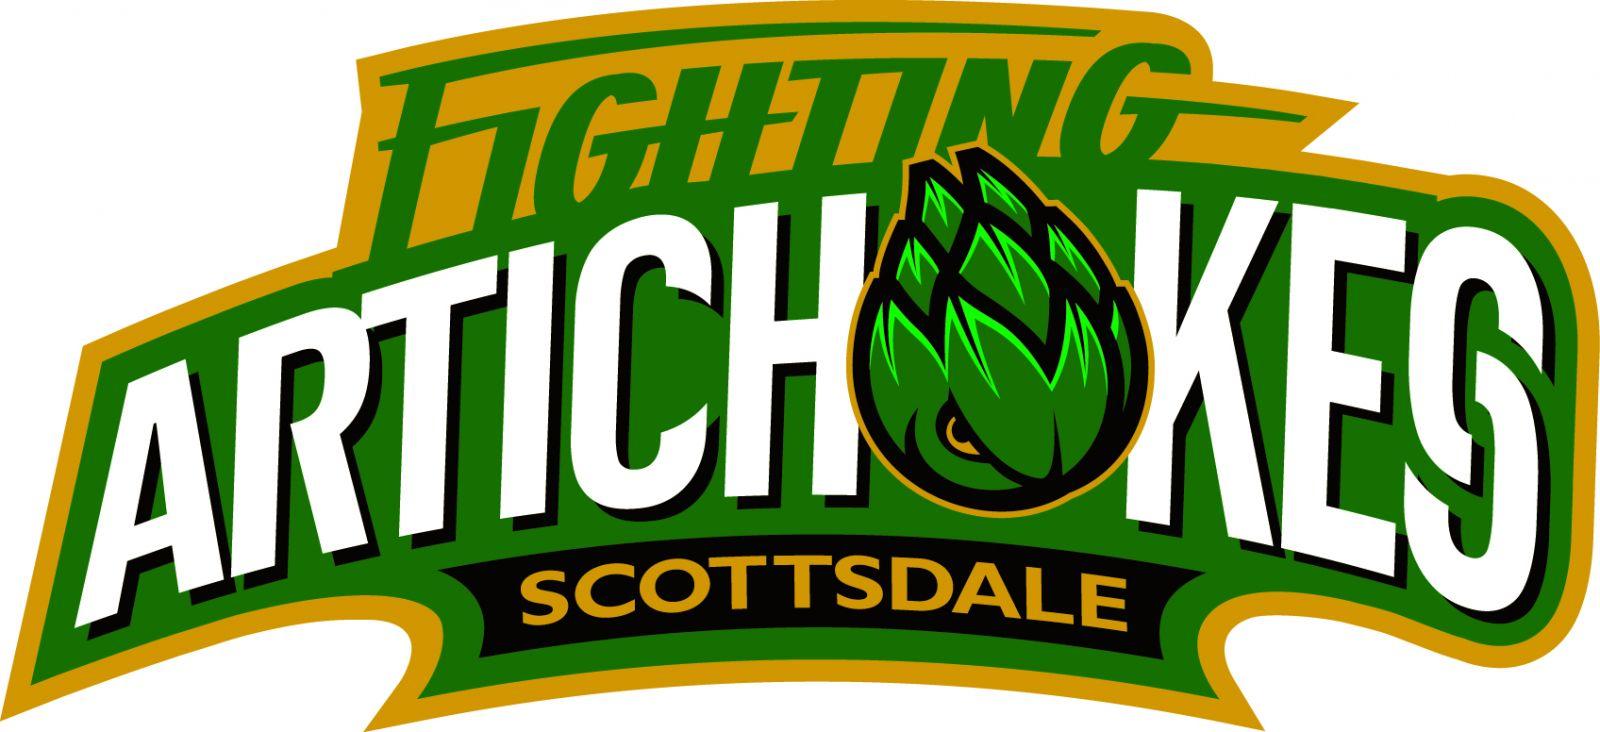 Scottsdale Community College Fighting Artichokes